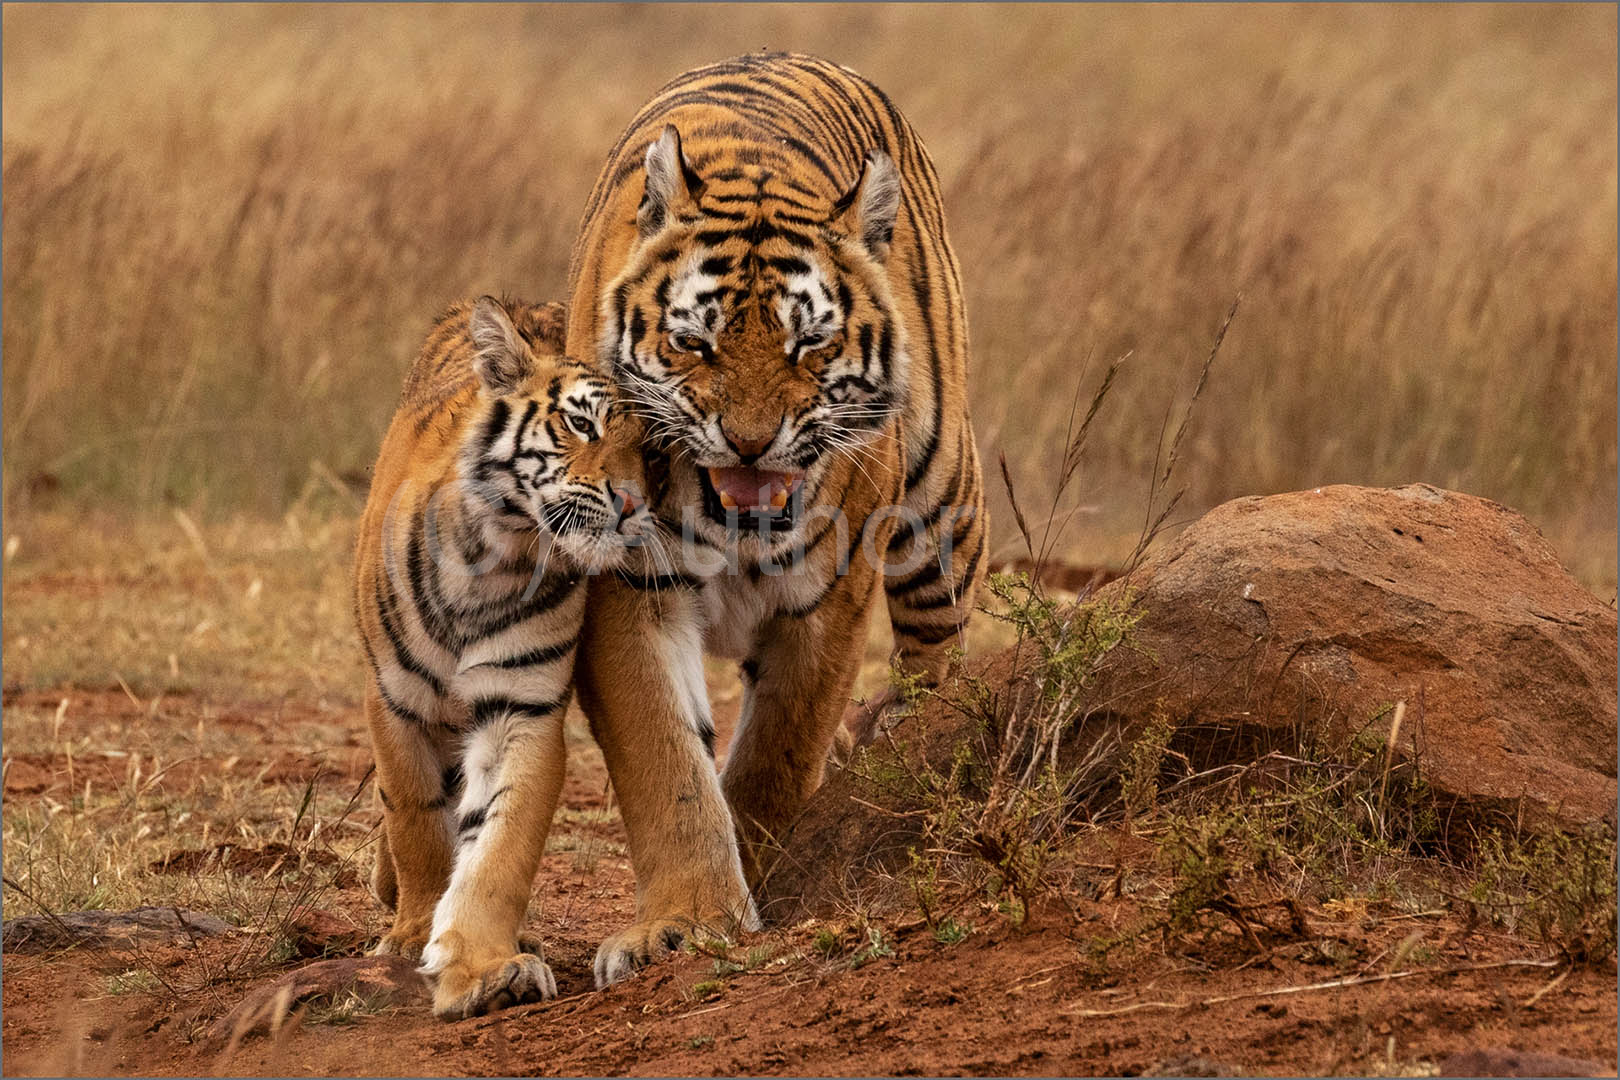 4_NA_Tiger Love _Stephen Kangisser